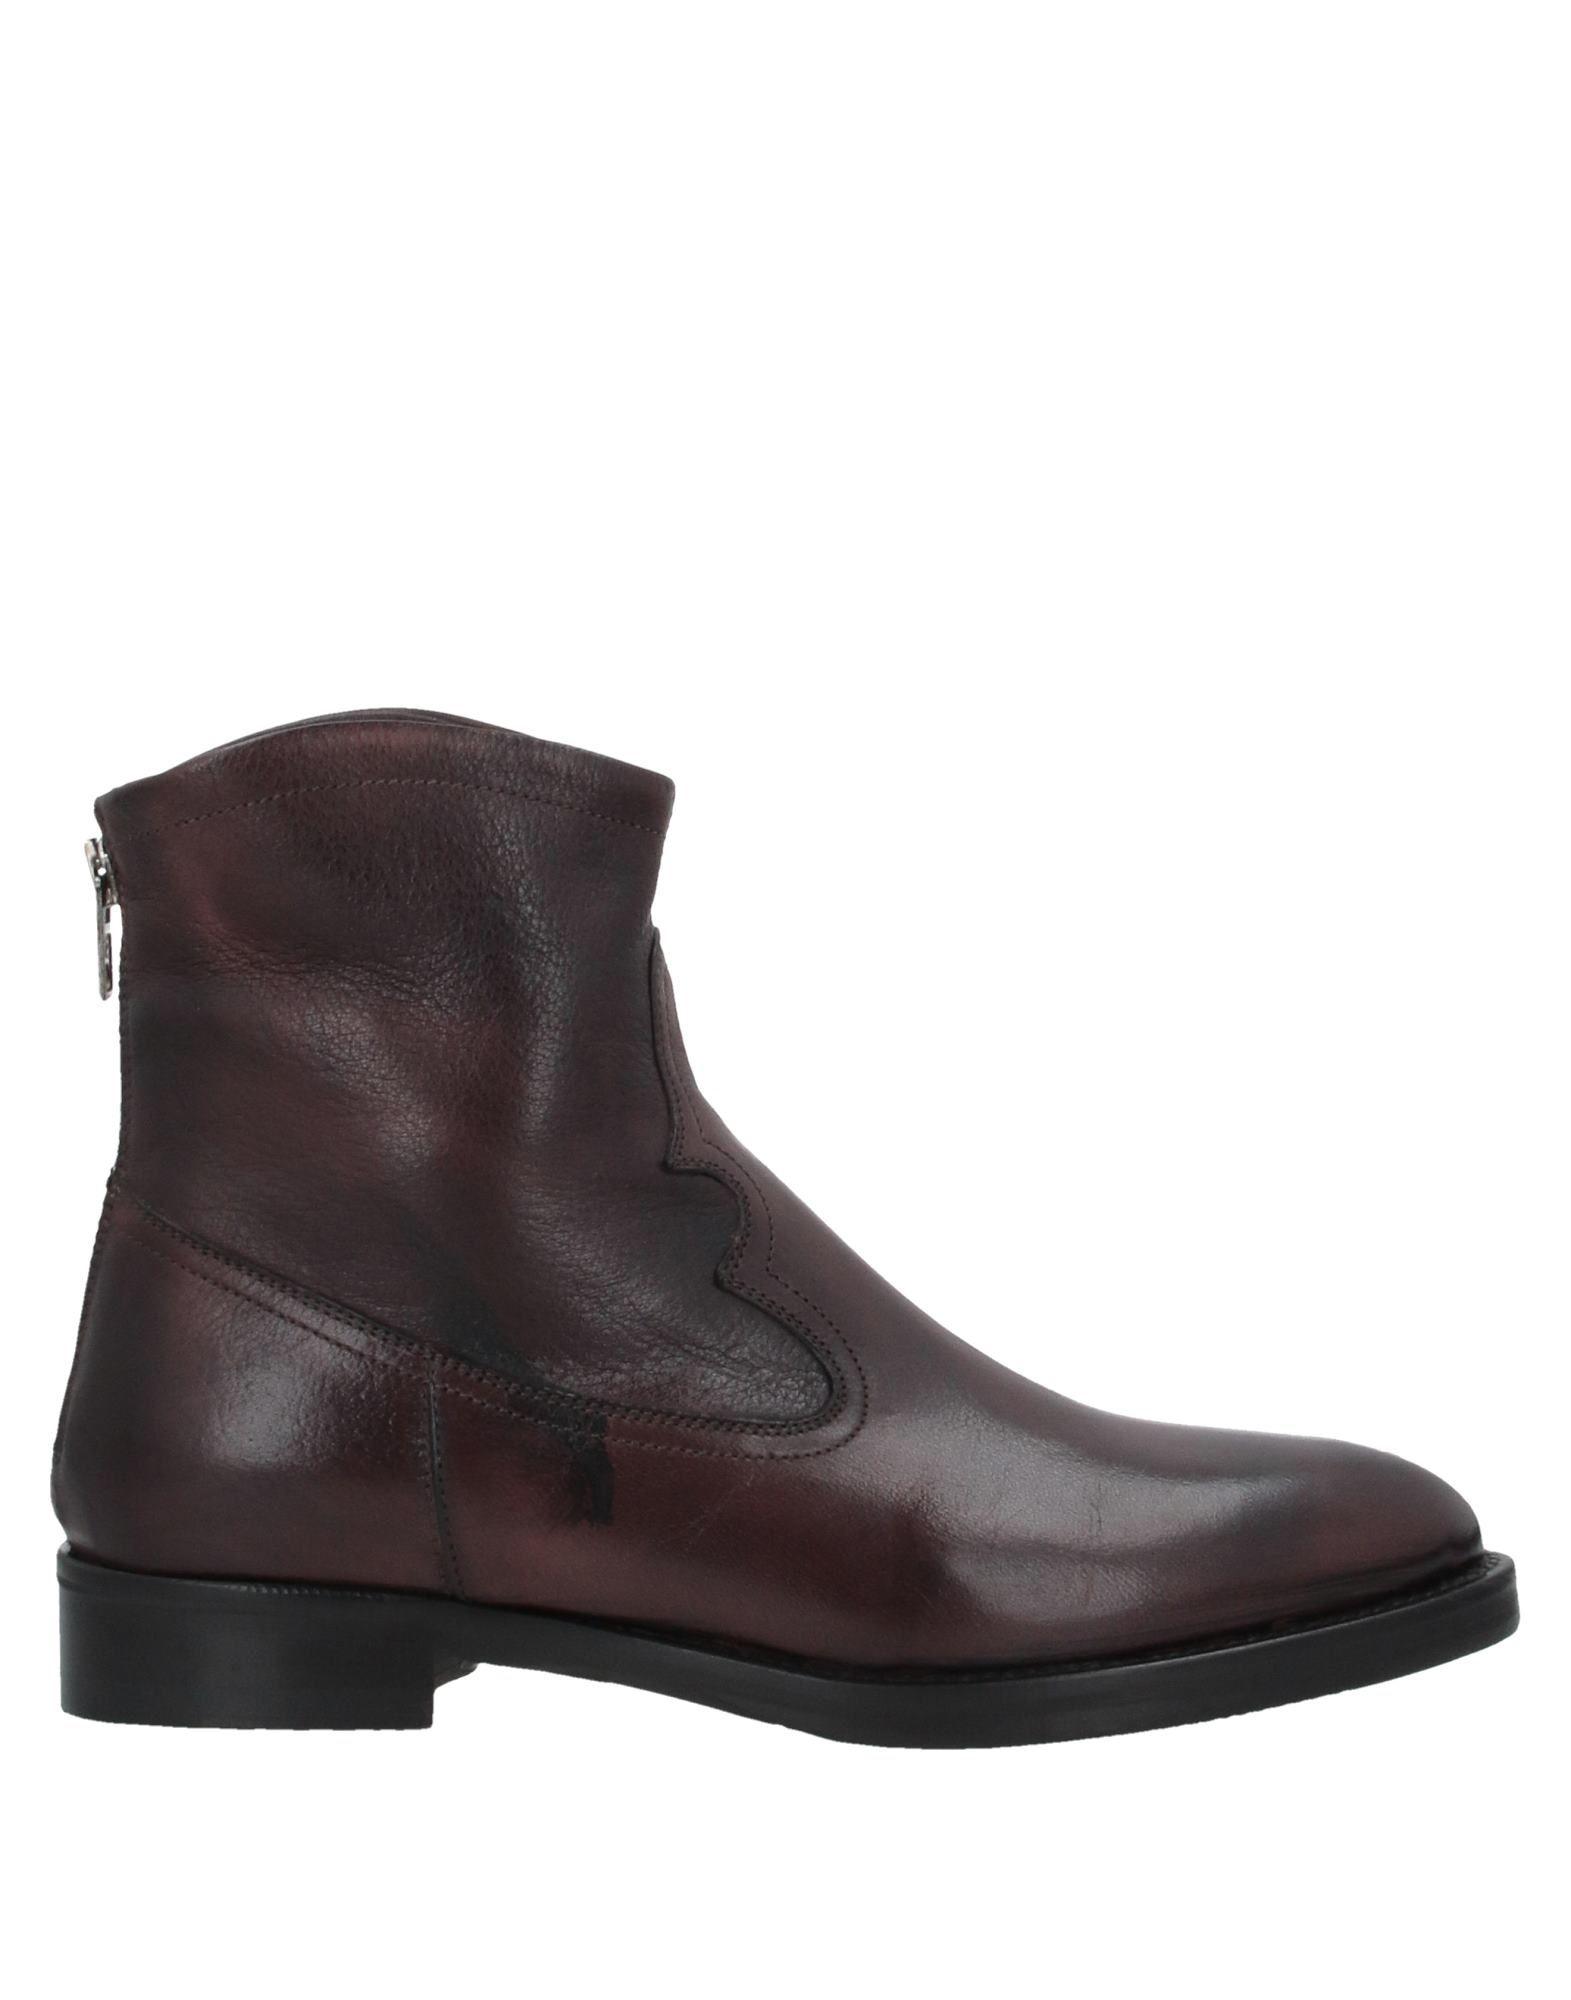 I-N - S-T-I-T-C-H-E-S Полусапоги и высокие ботинки t n prakash kaikeyi